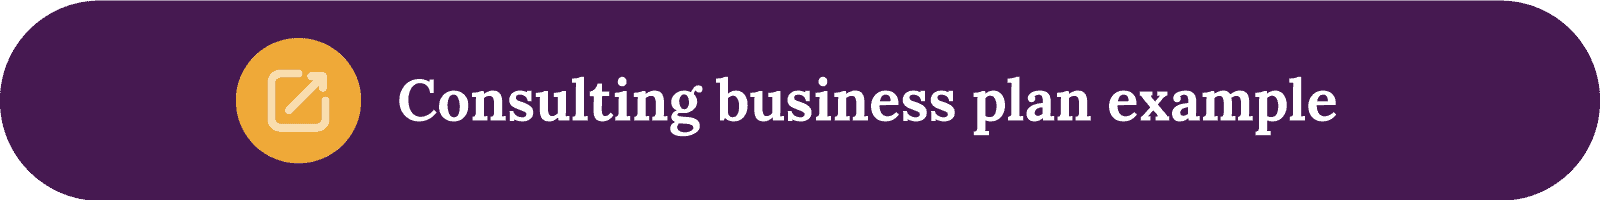 Download business financial plan template button